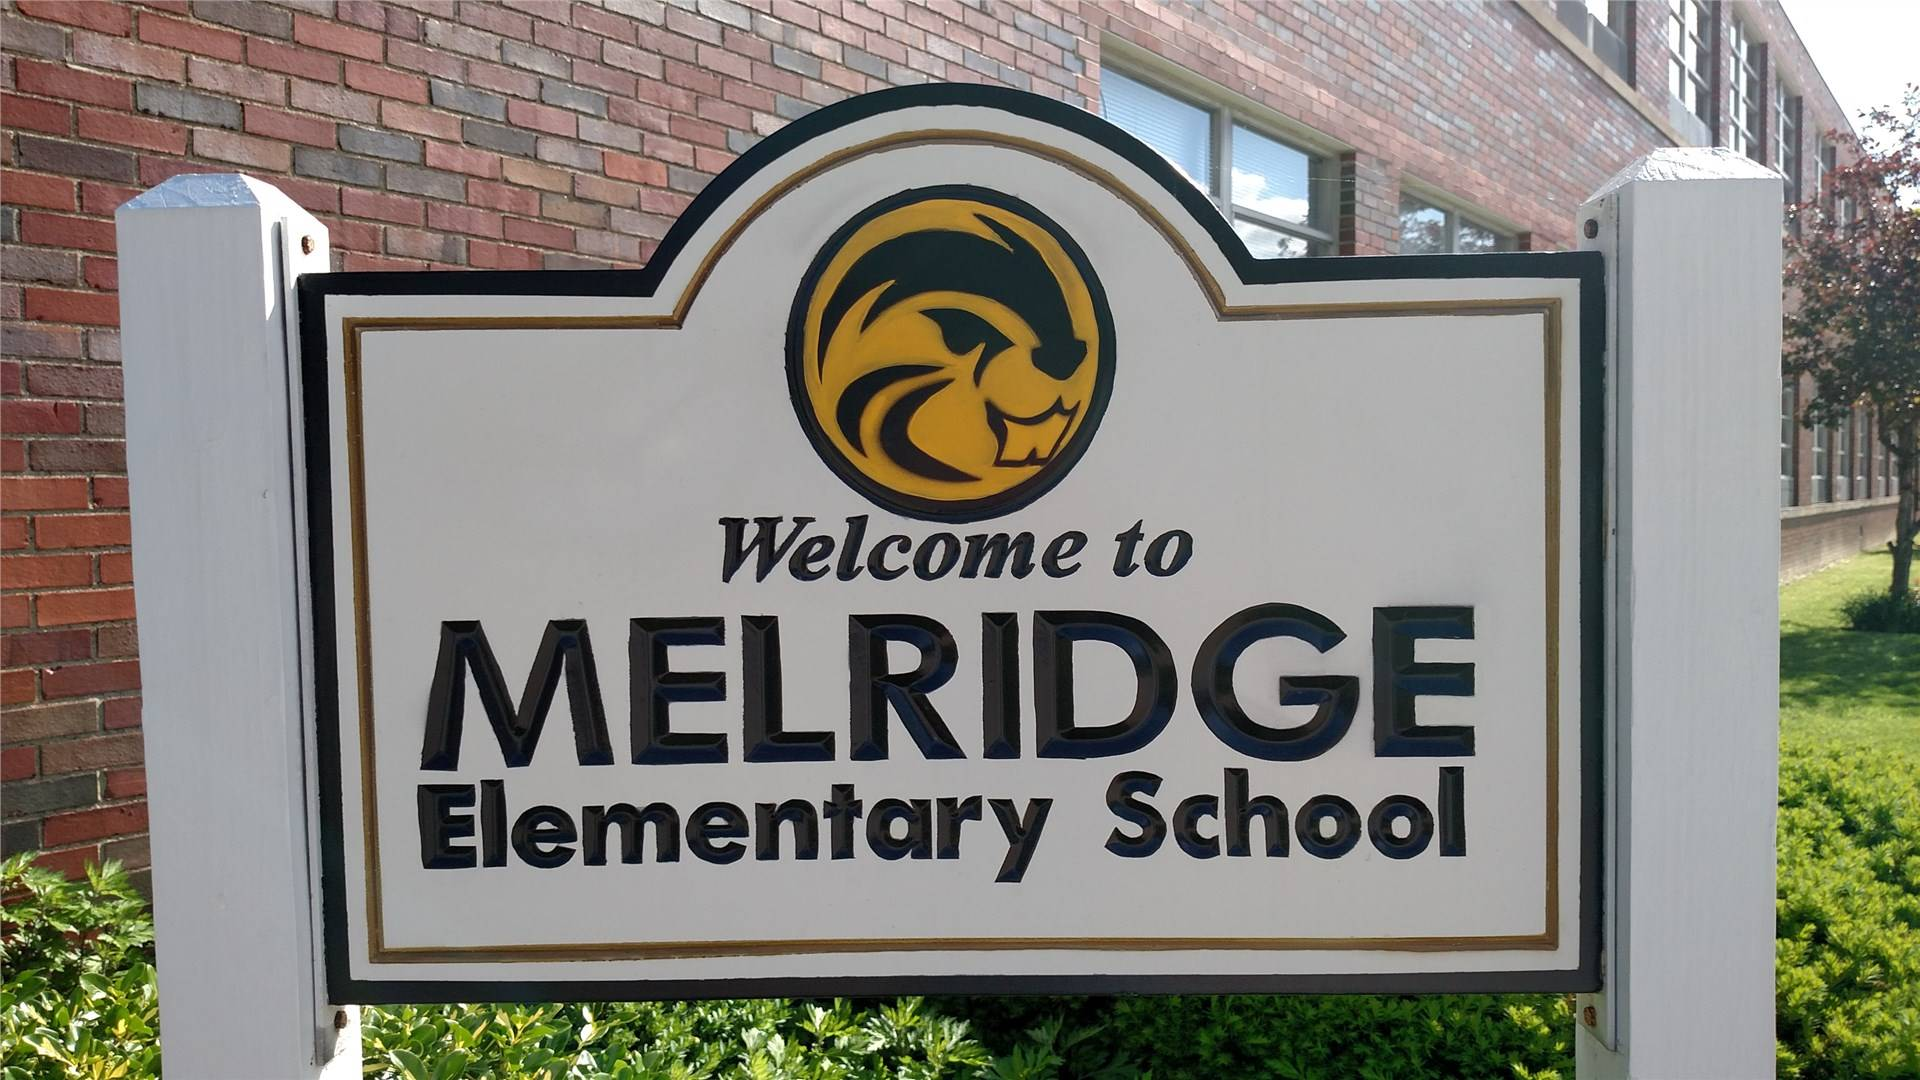 Melridge